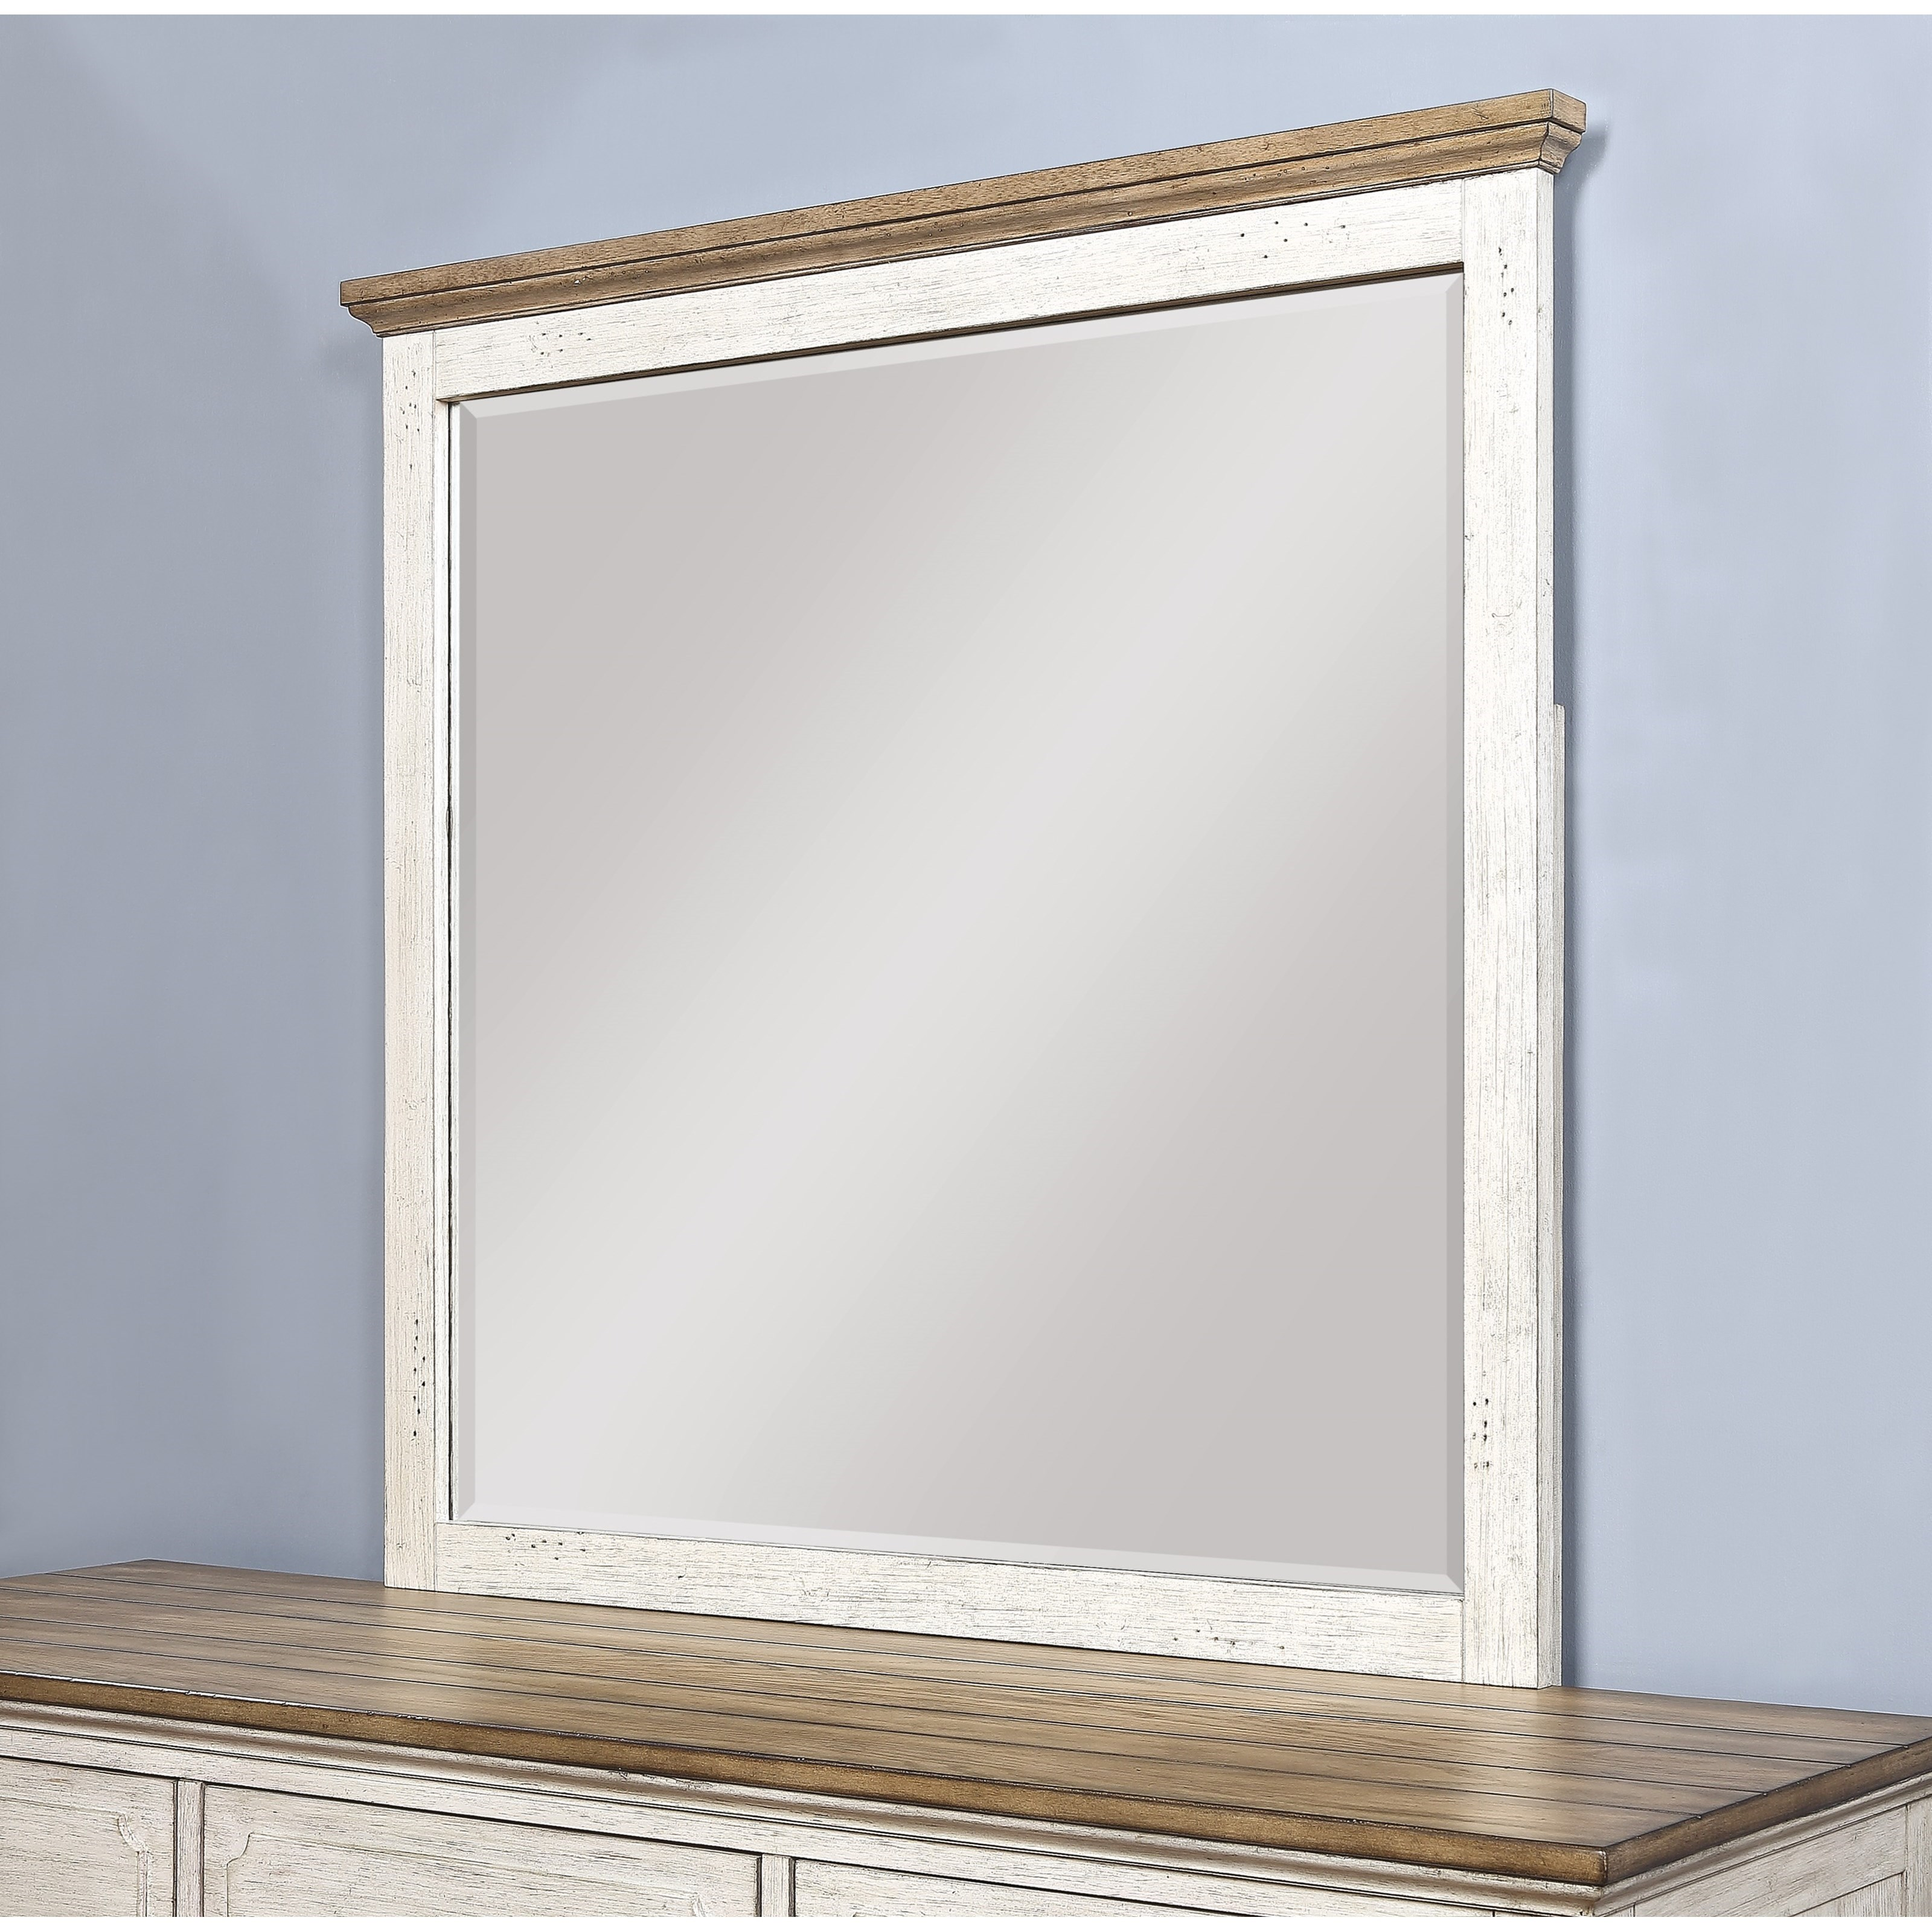 Gladys Gladys Dresser Mirror by Flexsteel Wynwood Collection at Morris Home